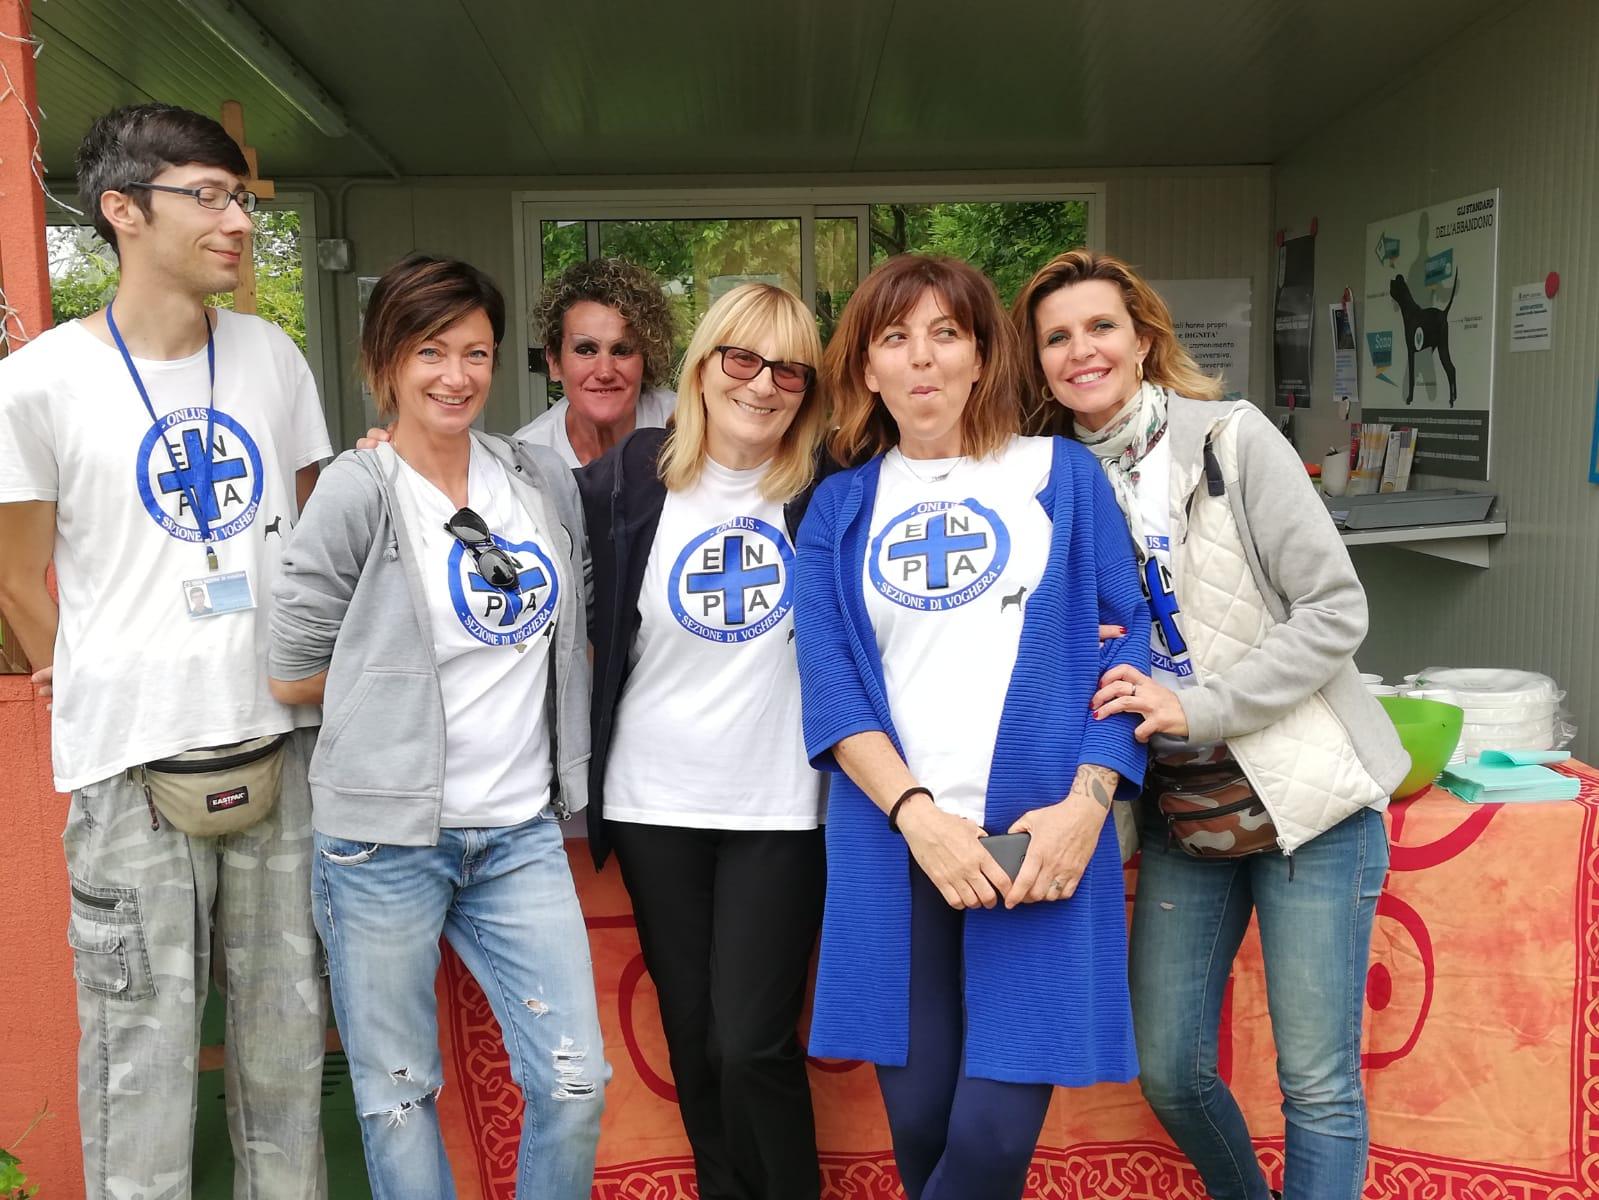 Foto dei volontari